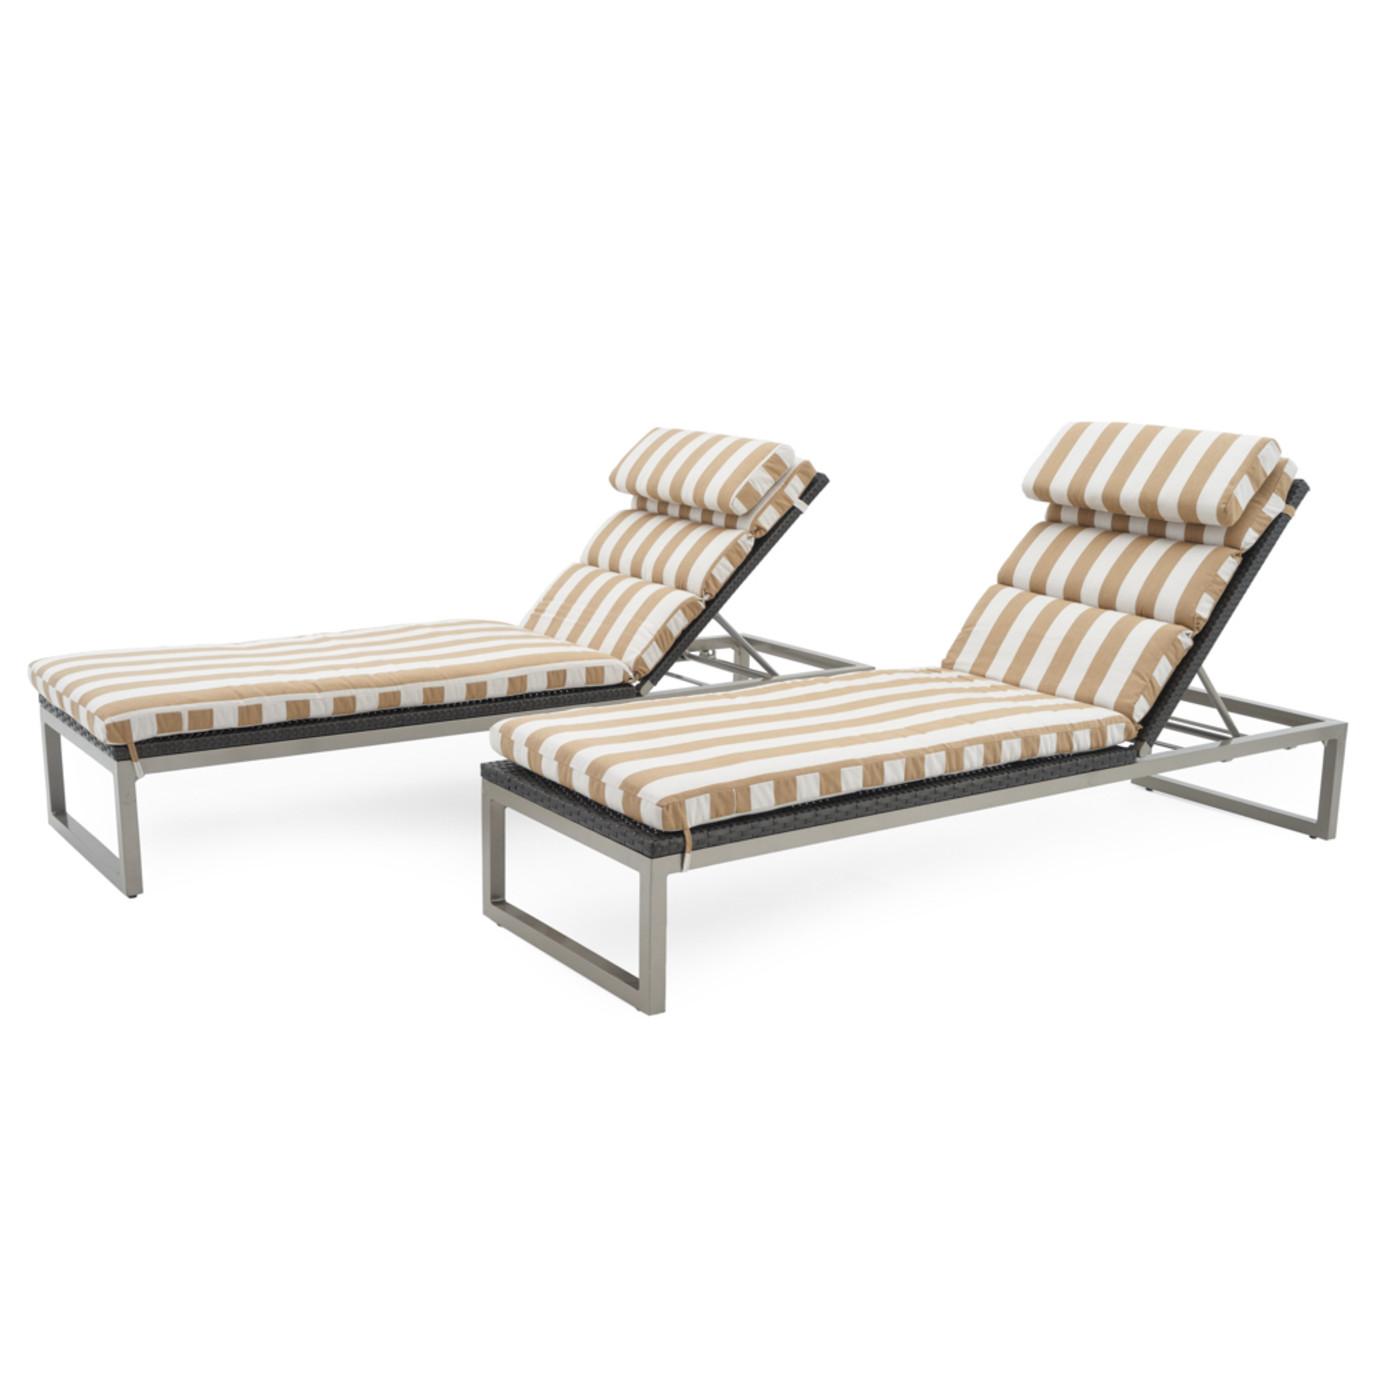 Milo™ Espresso Chaise Lounges - Maxim Beige